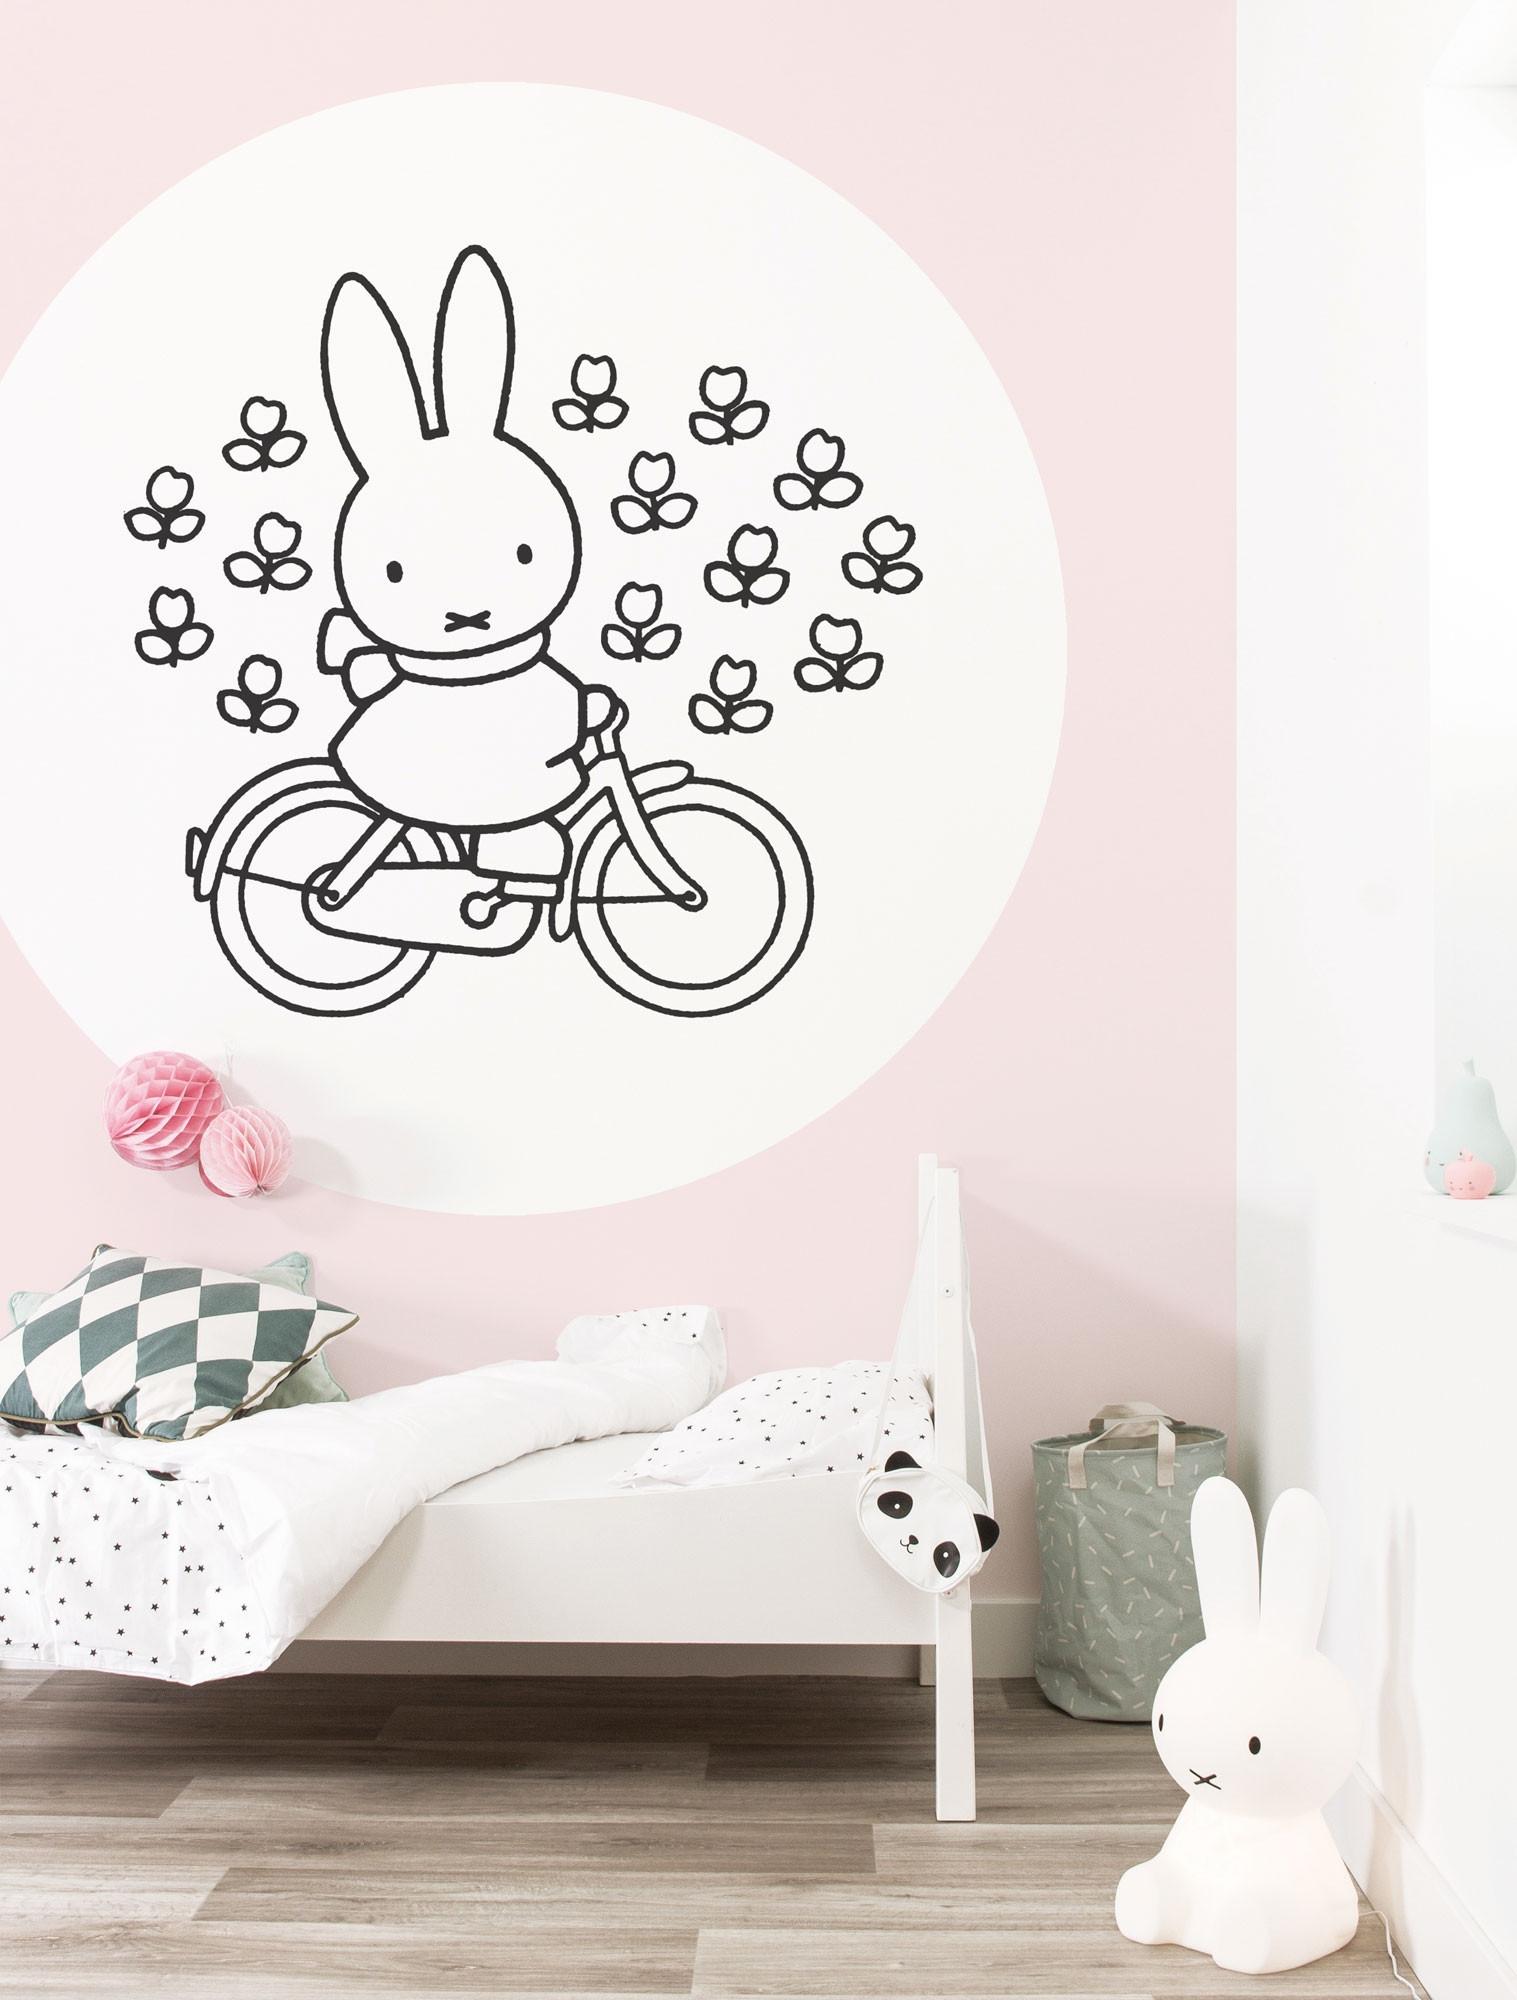 KEK Wallpaper Circle, Behangcirkel Nijntje op de fiets, ø 190 cm-8719743886025-35